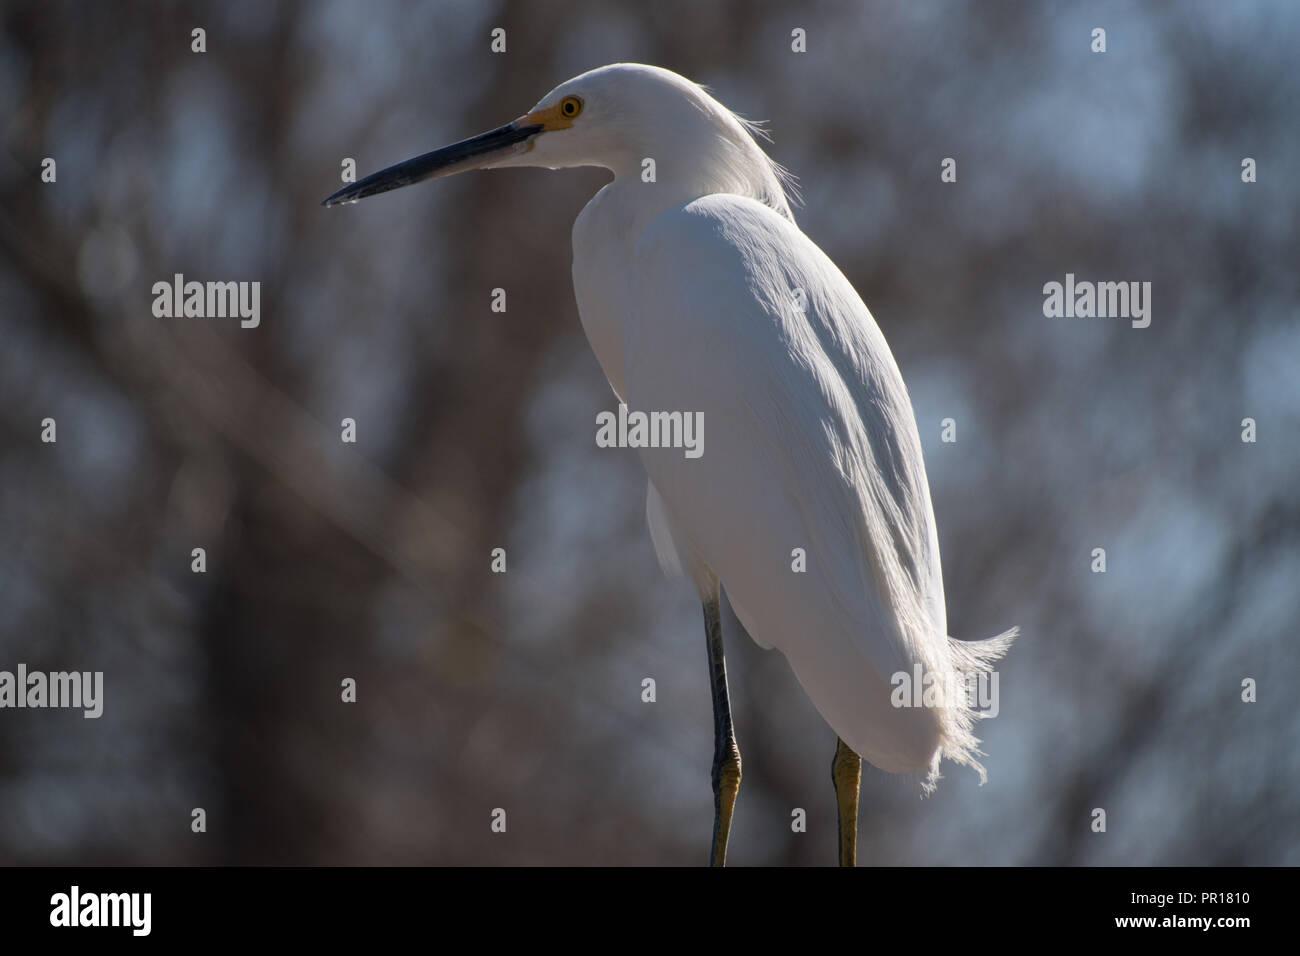 Egret against blurred background - Stock Image